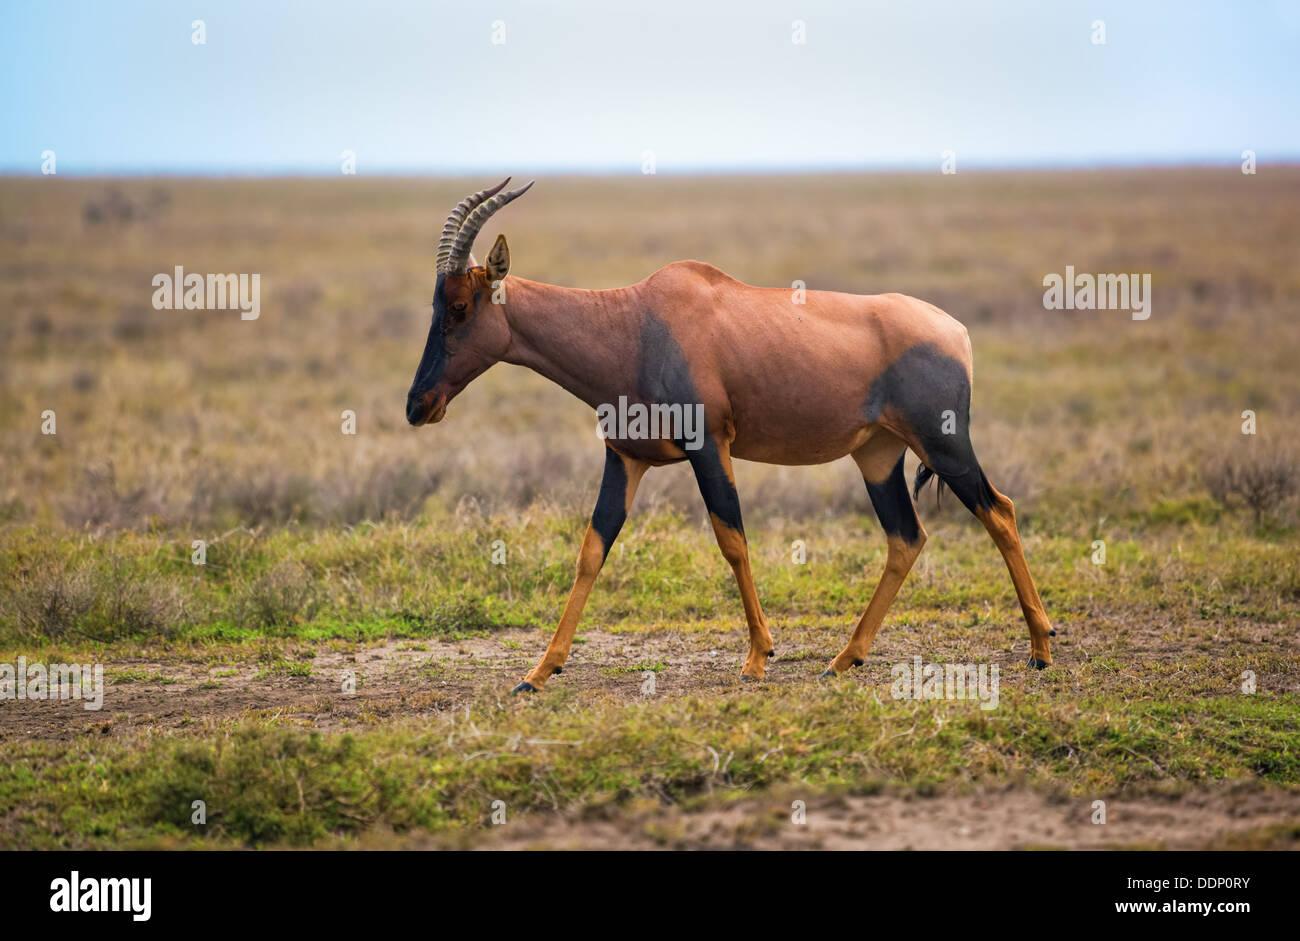 Topi, (Damaliscus korrigum) antelope in the Serengeti National Park, Tanzania, Africa - Stock Image